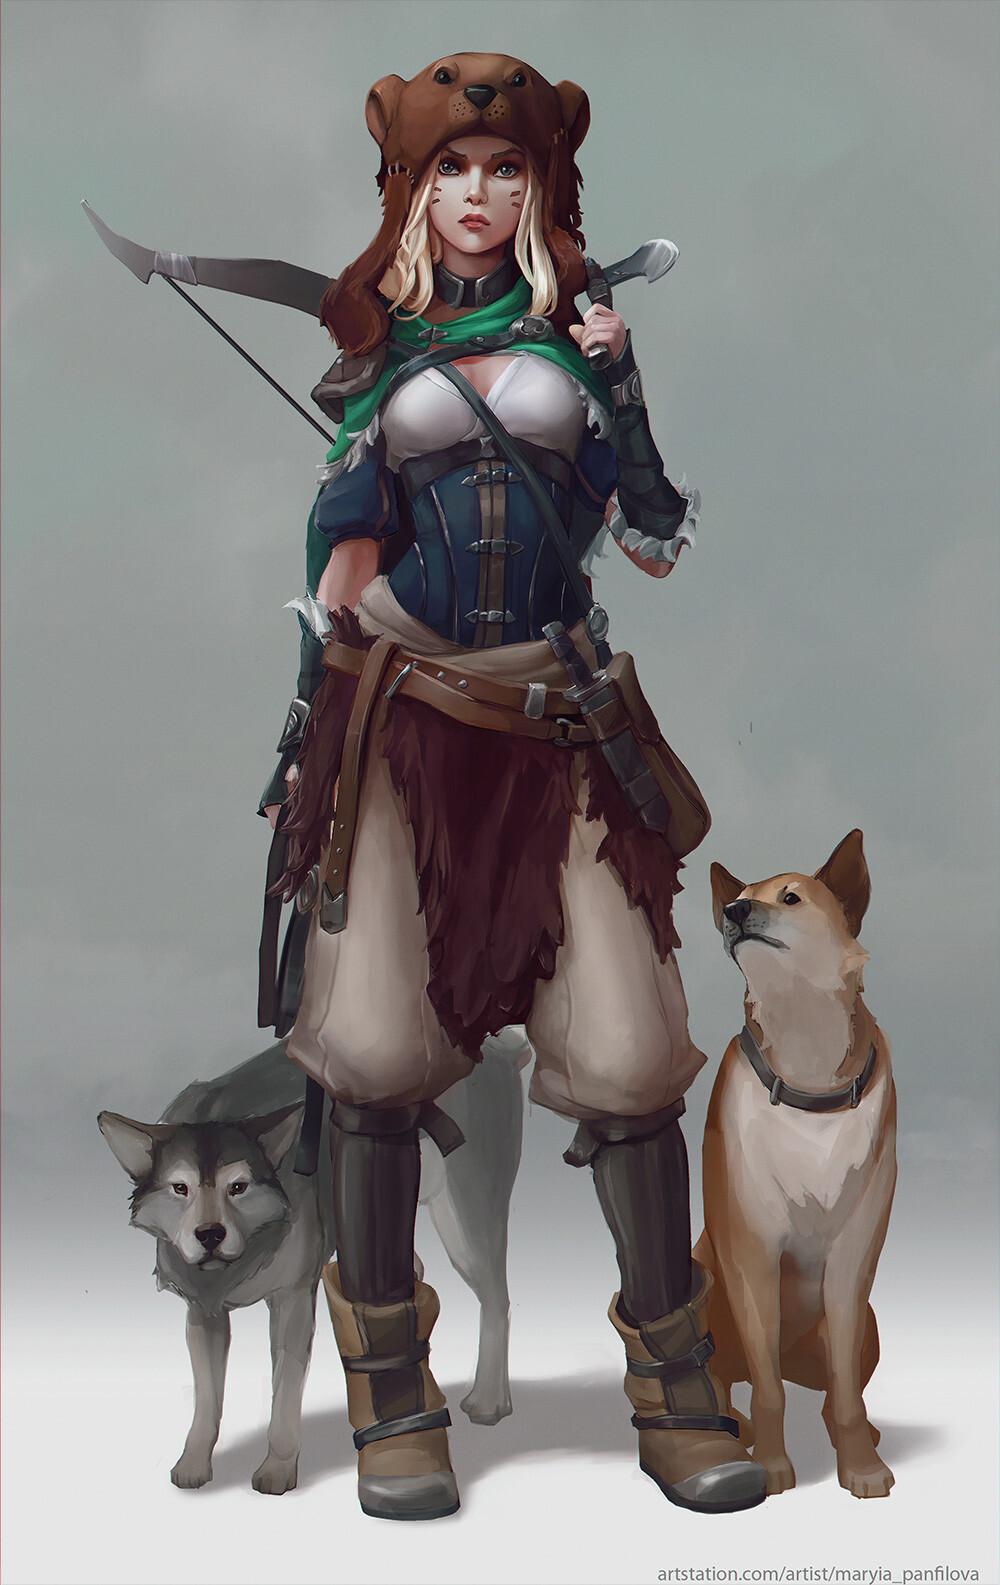 maria-panfilova-huntress01.jpg